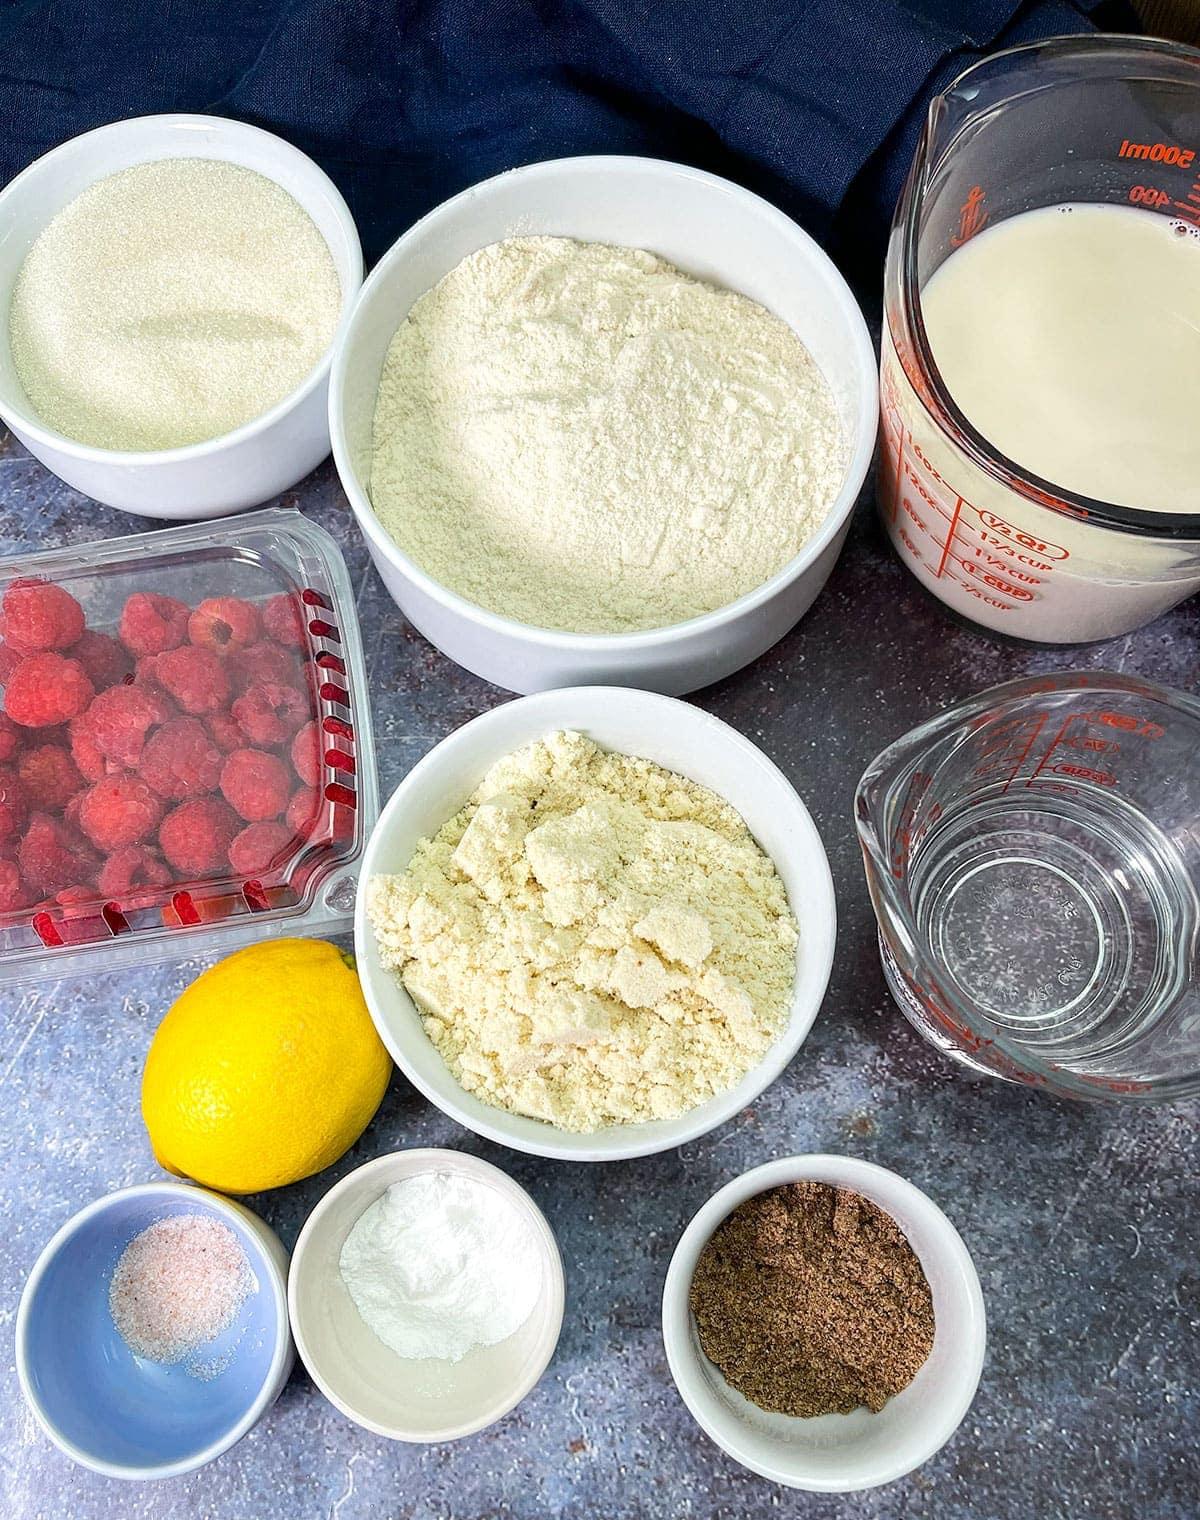 raspberry lemon cake ingredients on a grey background